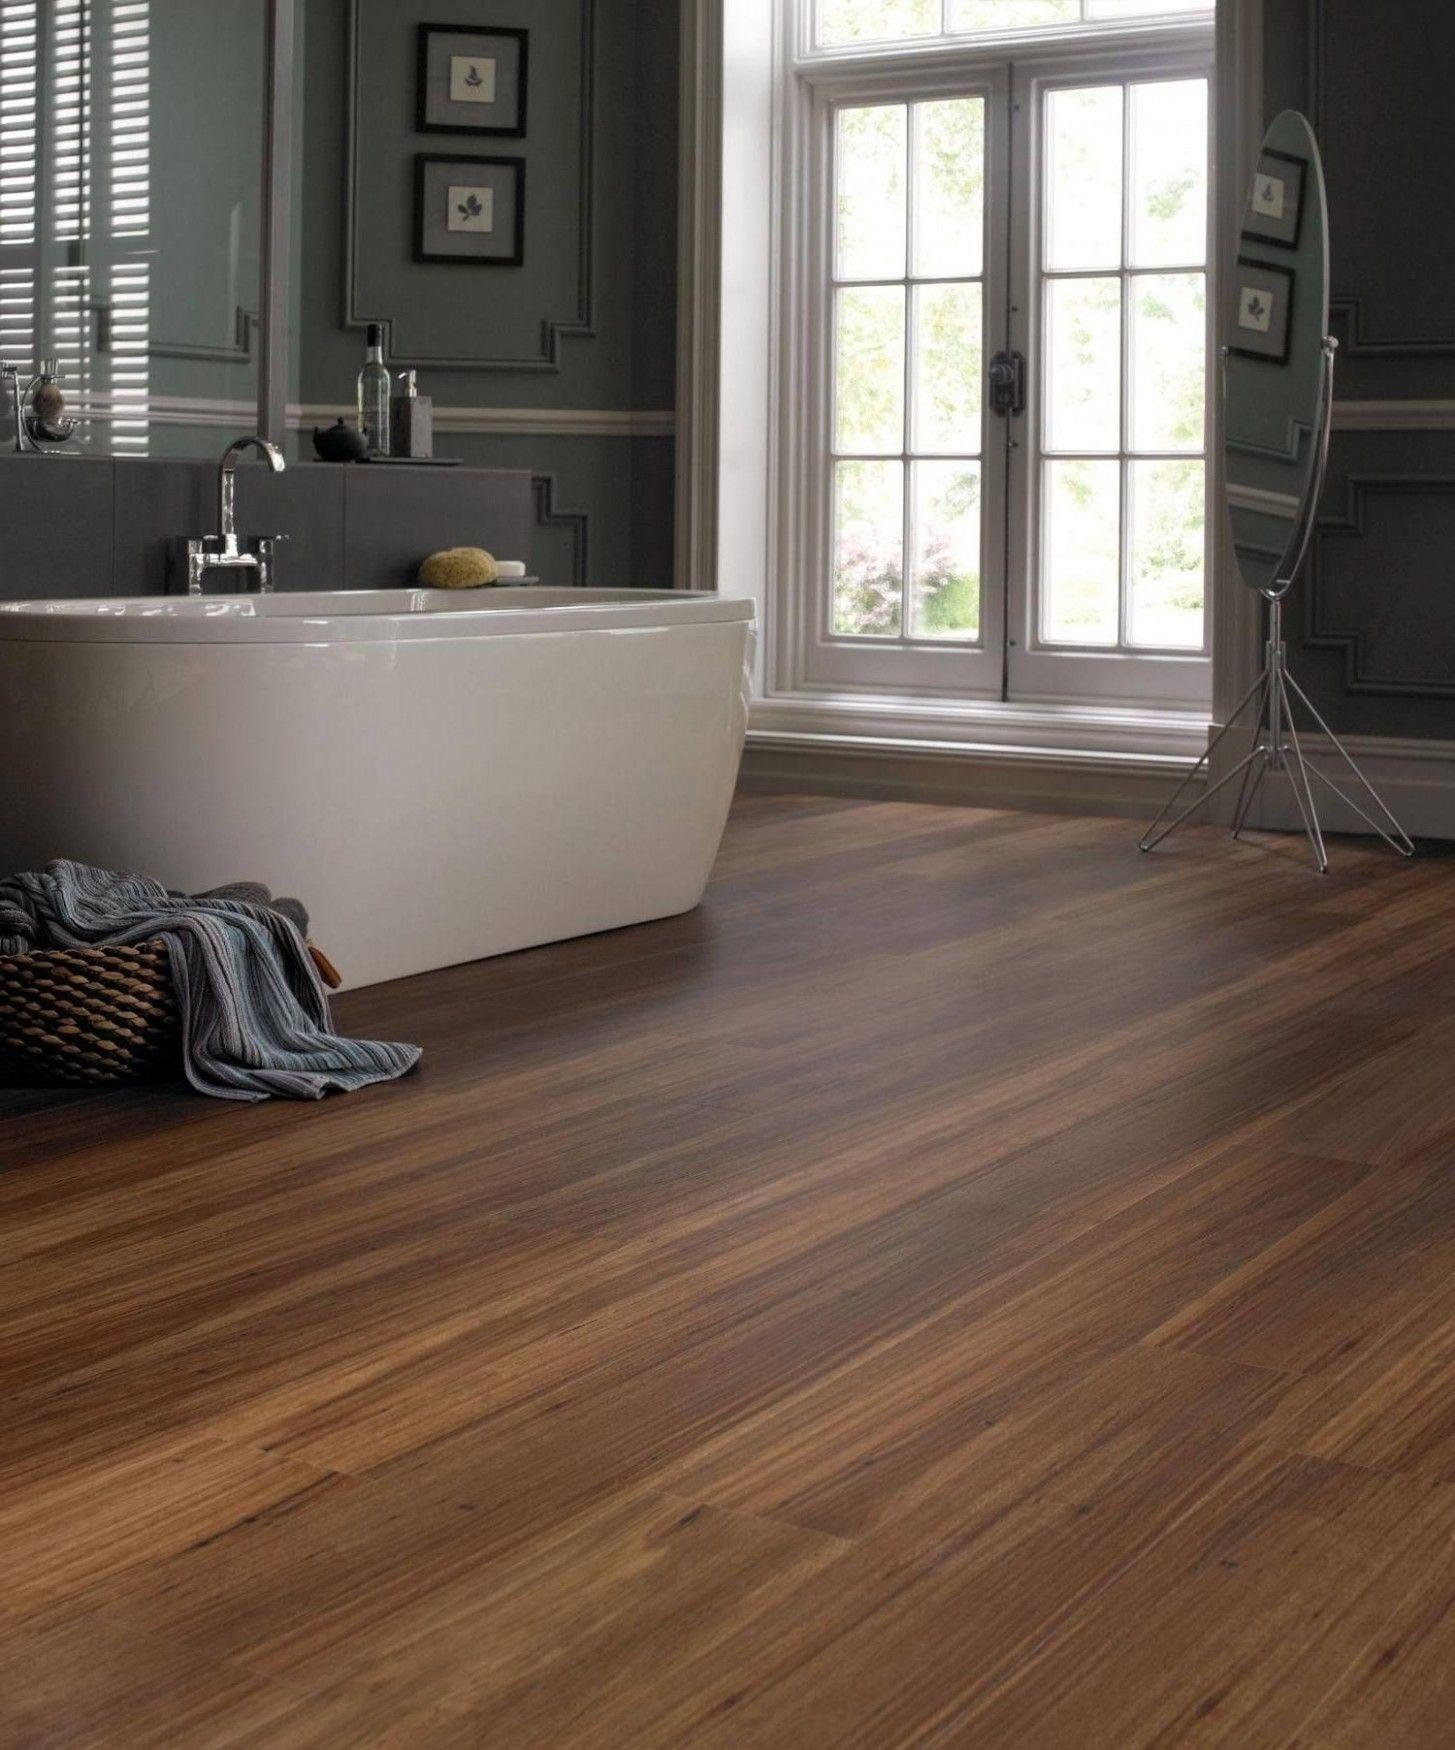 Alternative Bathroom Floor Ideas Each anniversary Mansion ...